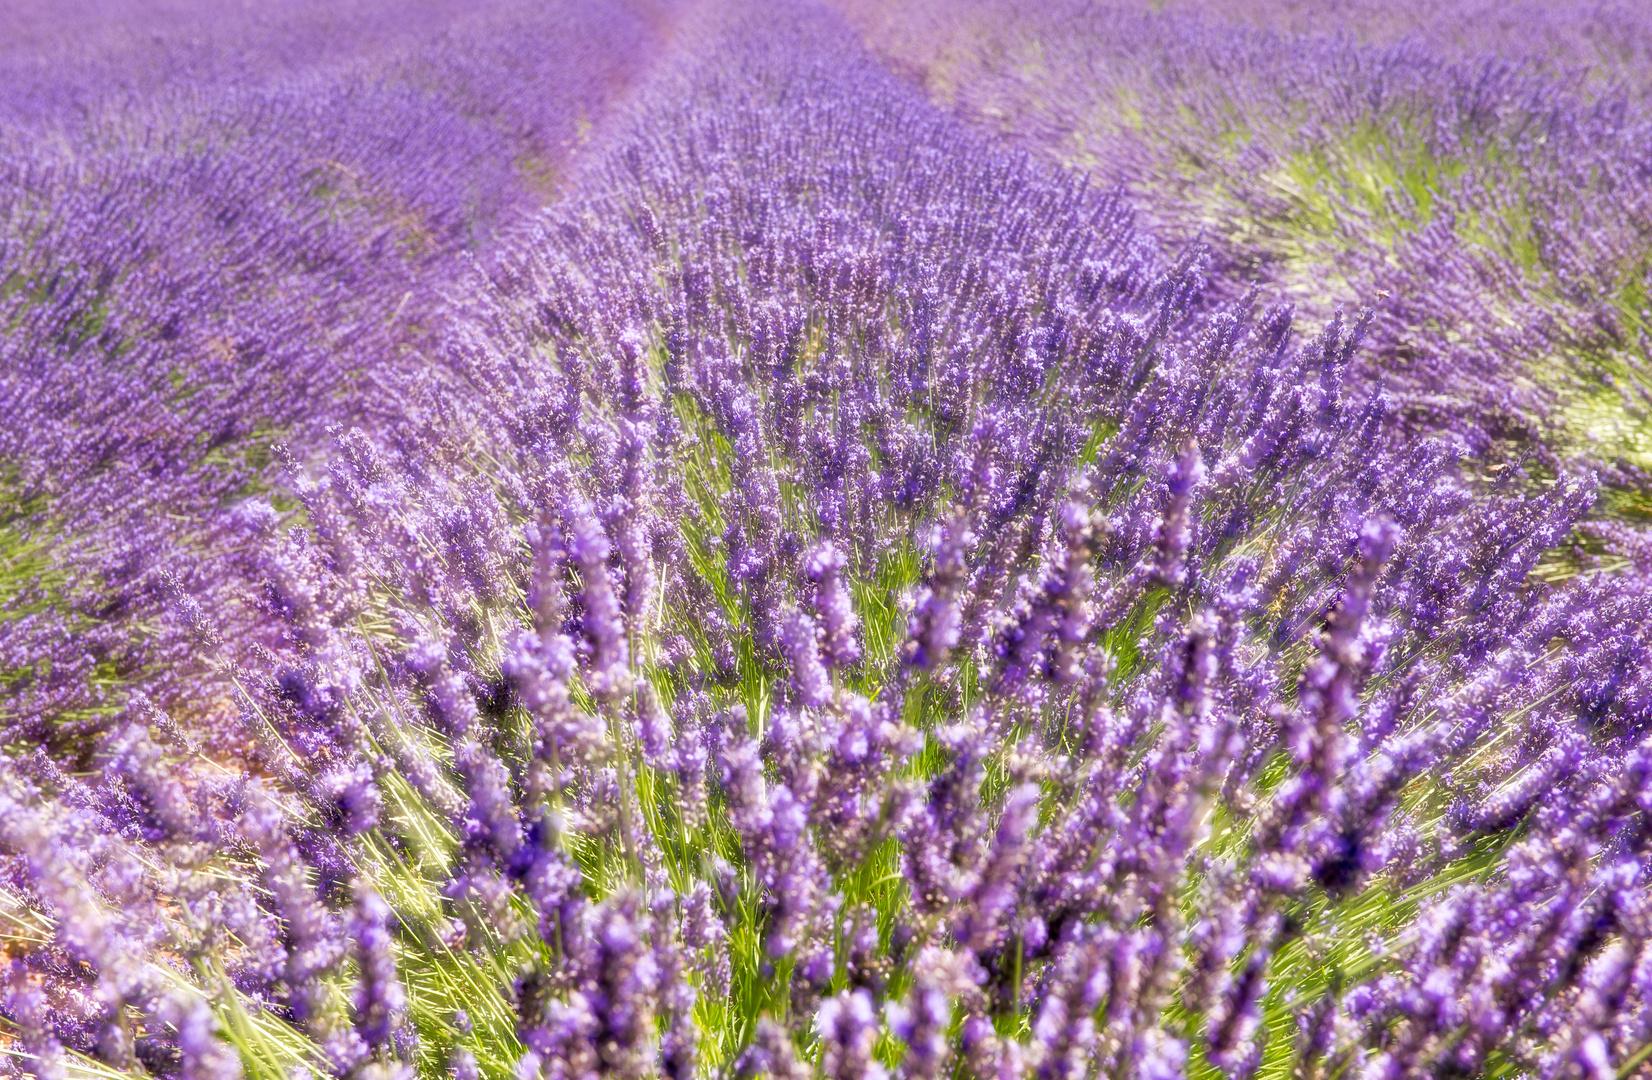 Traumwelt Lavendelfeld